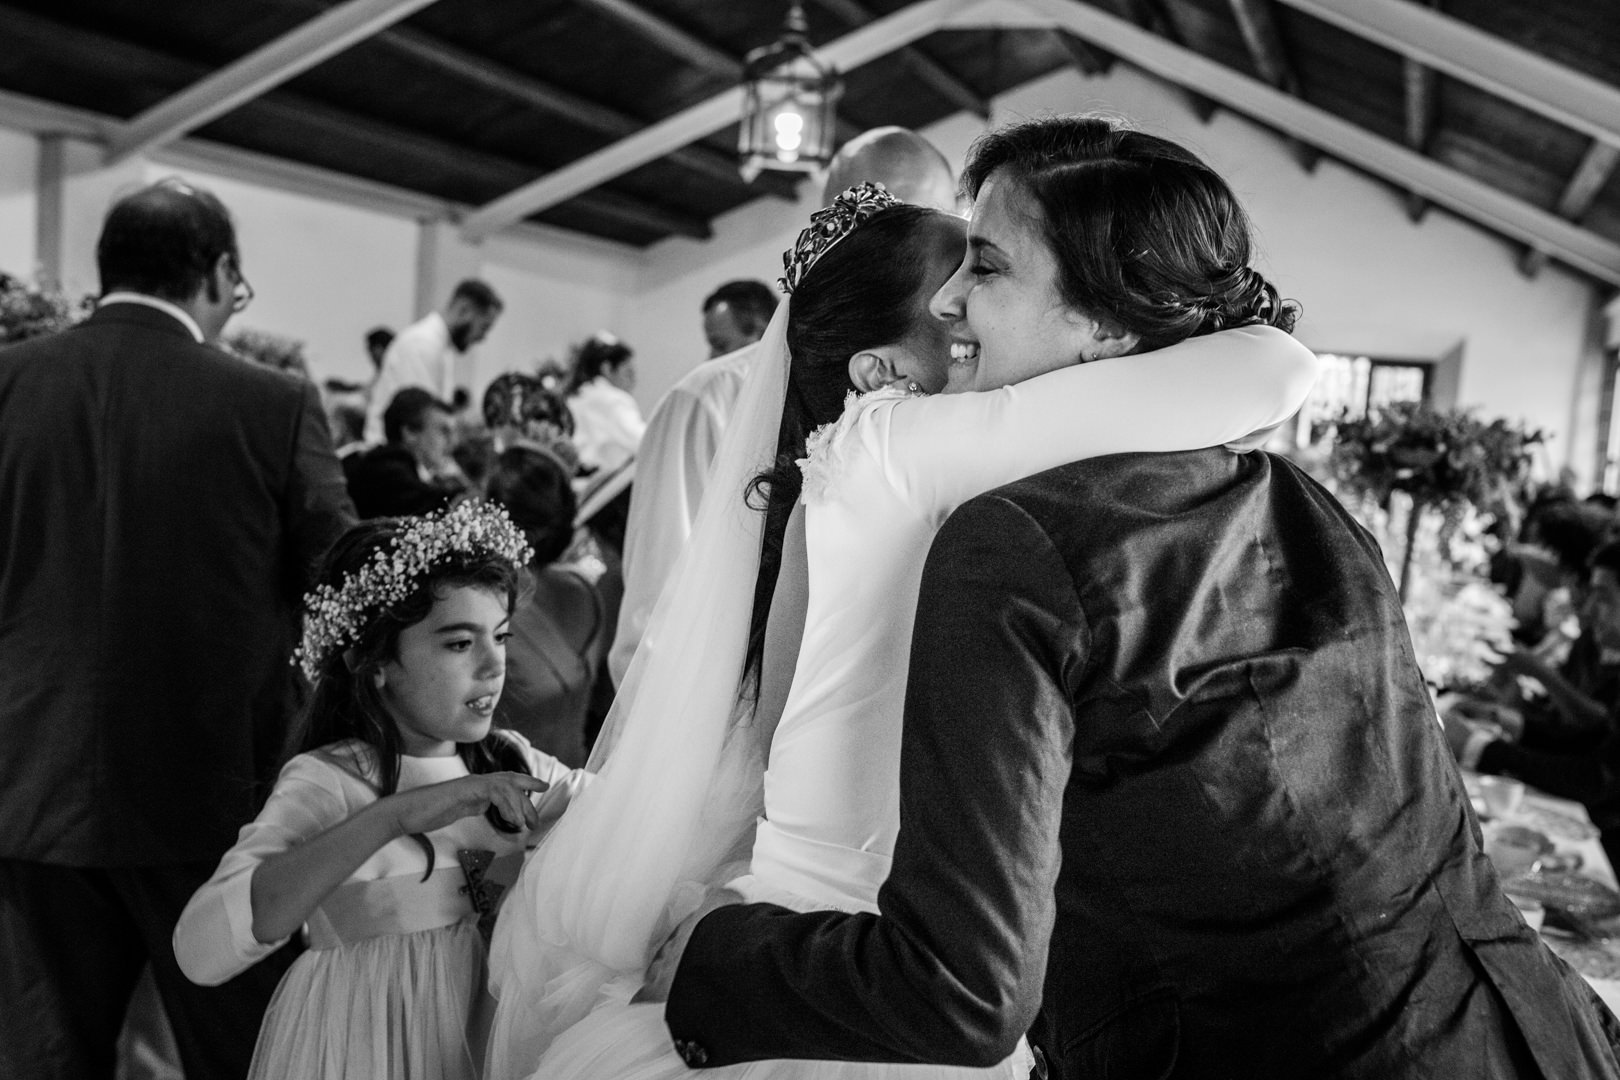 Boda-sevilla-Wedding-engagement-Rafael-Torres-fotografo-bodas-sevilla-madrid-barcelona-wedding-photographer--61.jpg